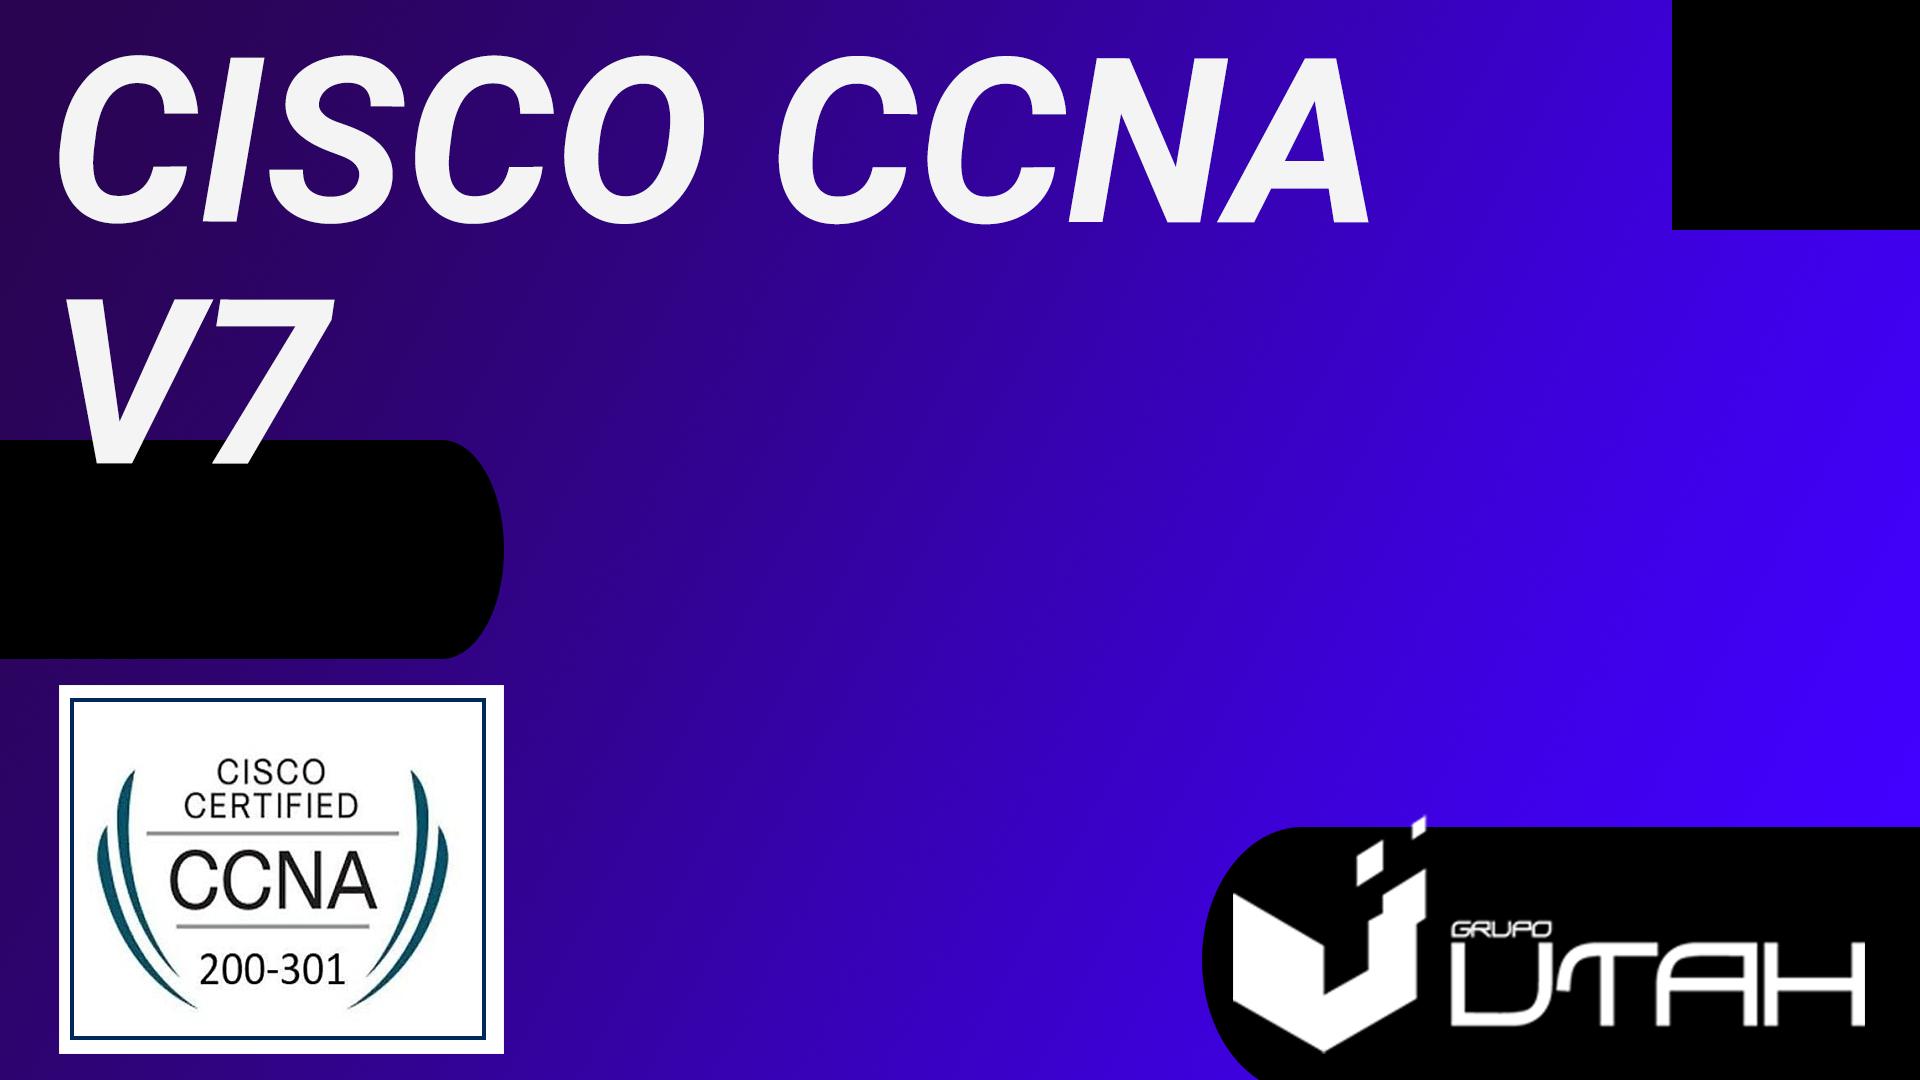 CISCO - CCNA V7 -N4 - 2021